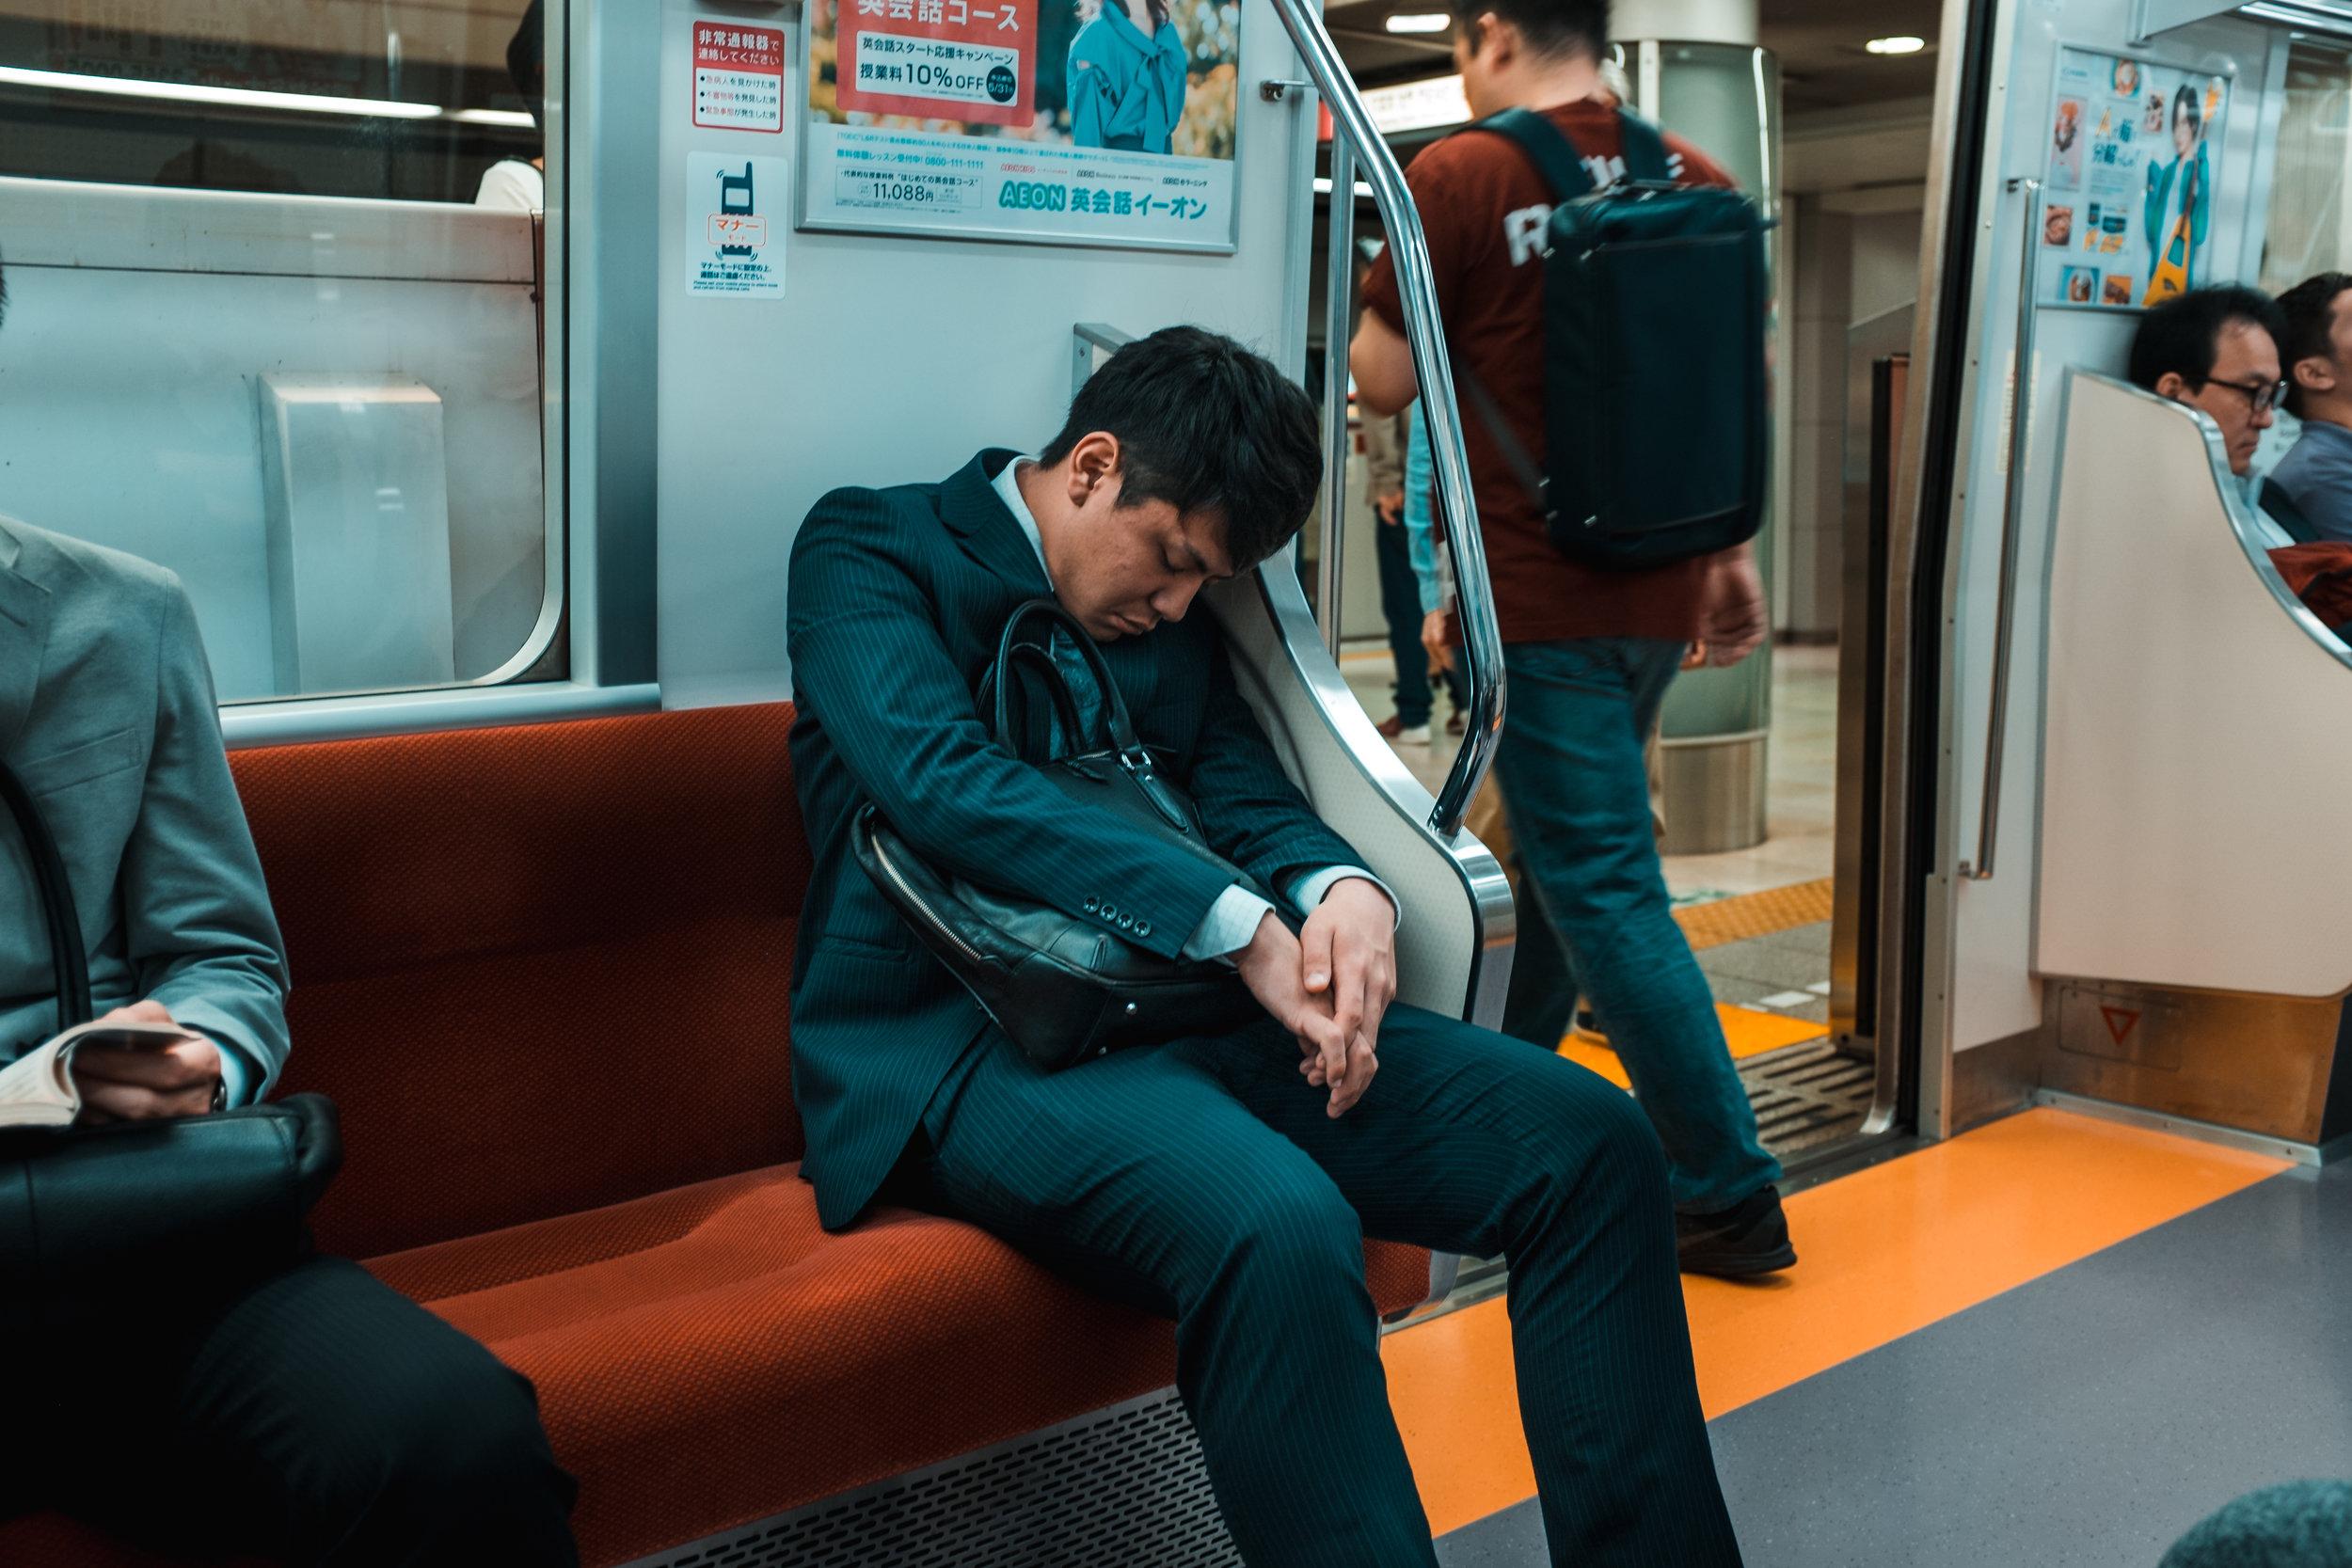 TokyoJapan_2018_AdamDillon_DSCF9088.jpg